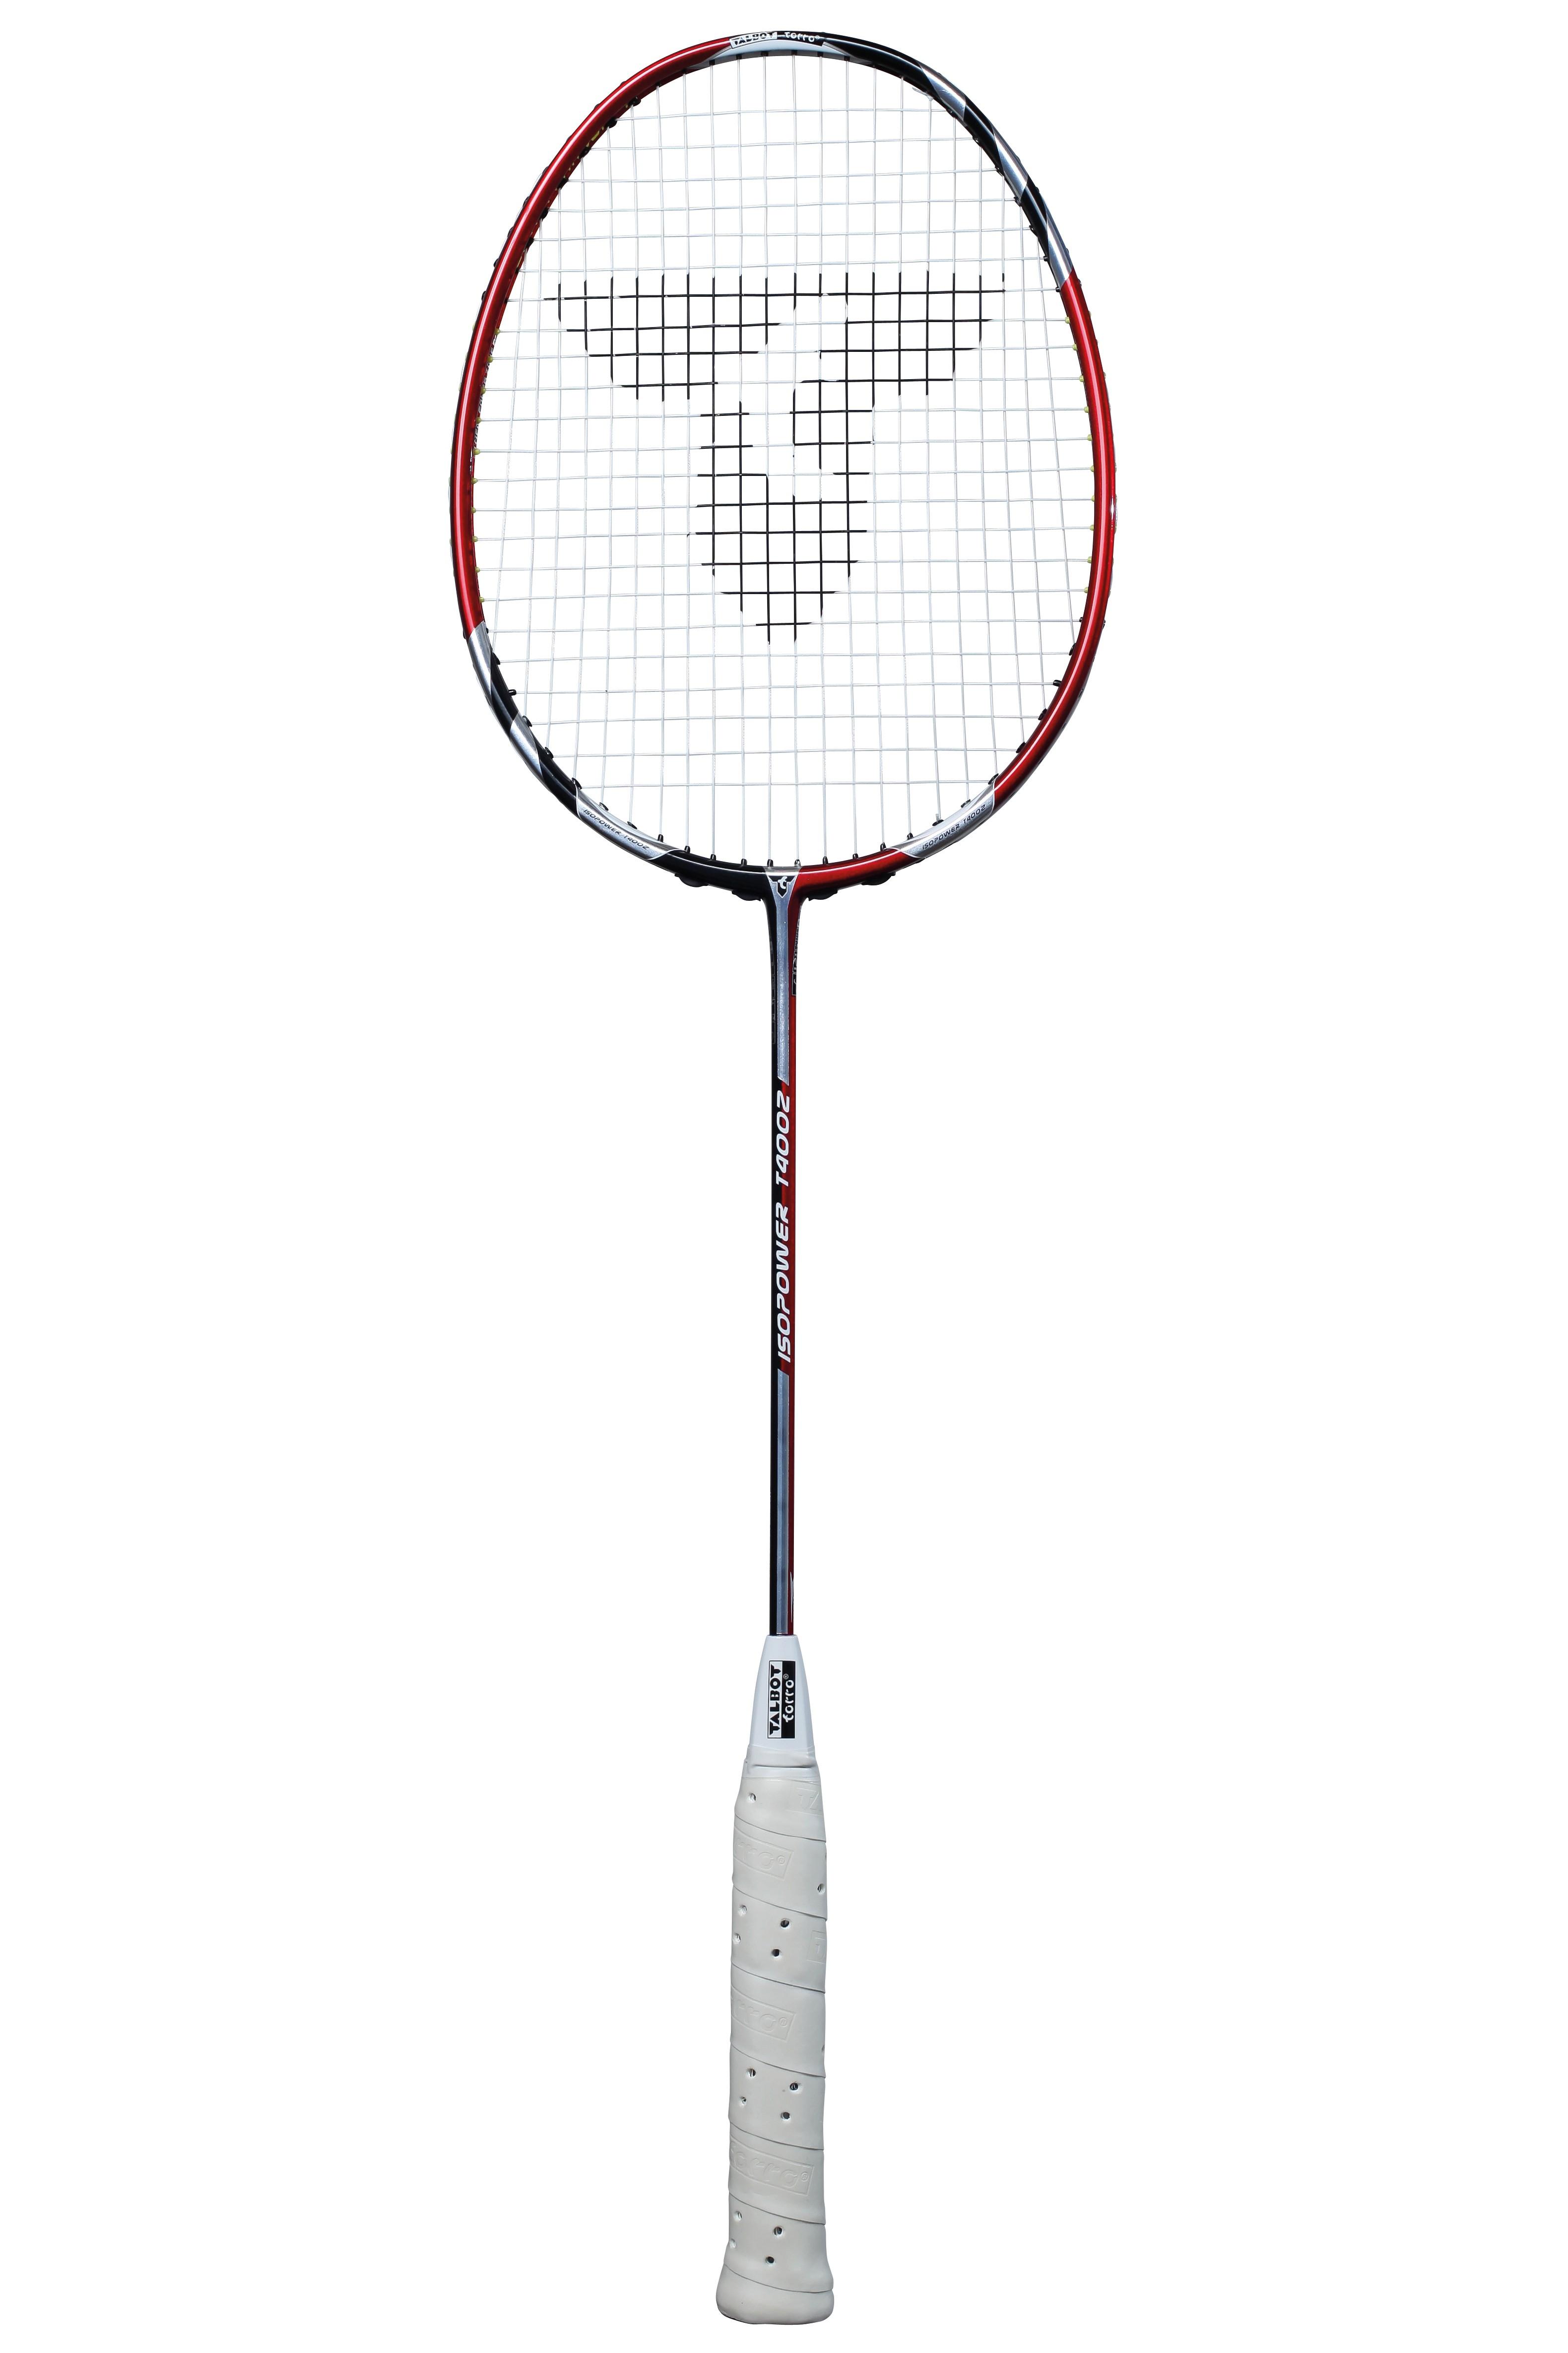 Racheta Badminton  Talbot Torro  Offensive  Isopower  T4002  85 G